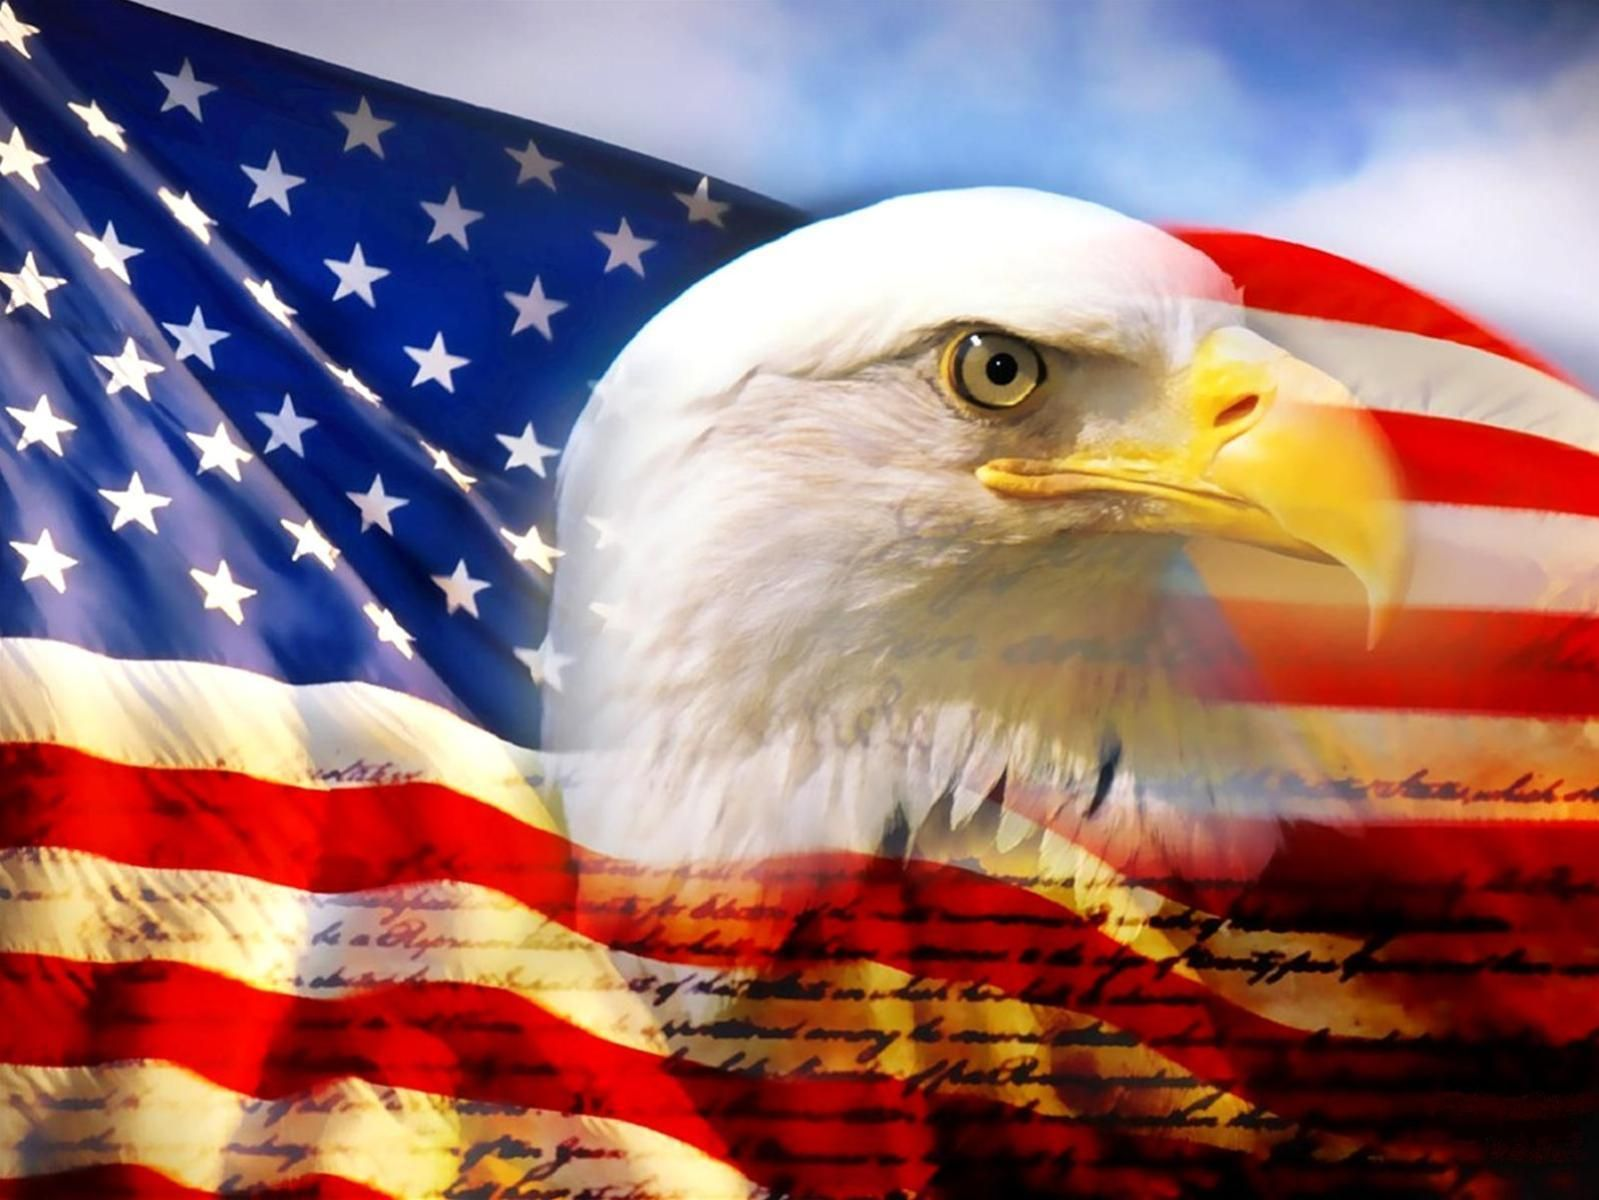 USA Flag With Eagle Wallpaper